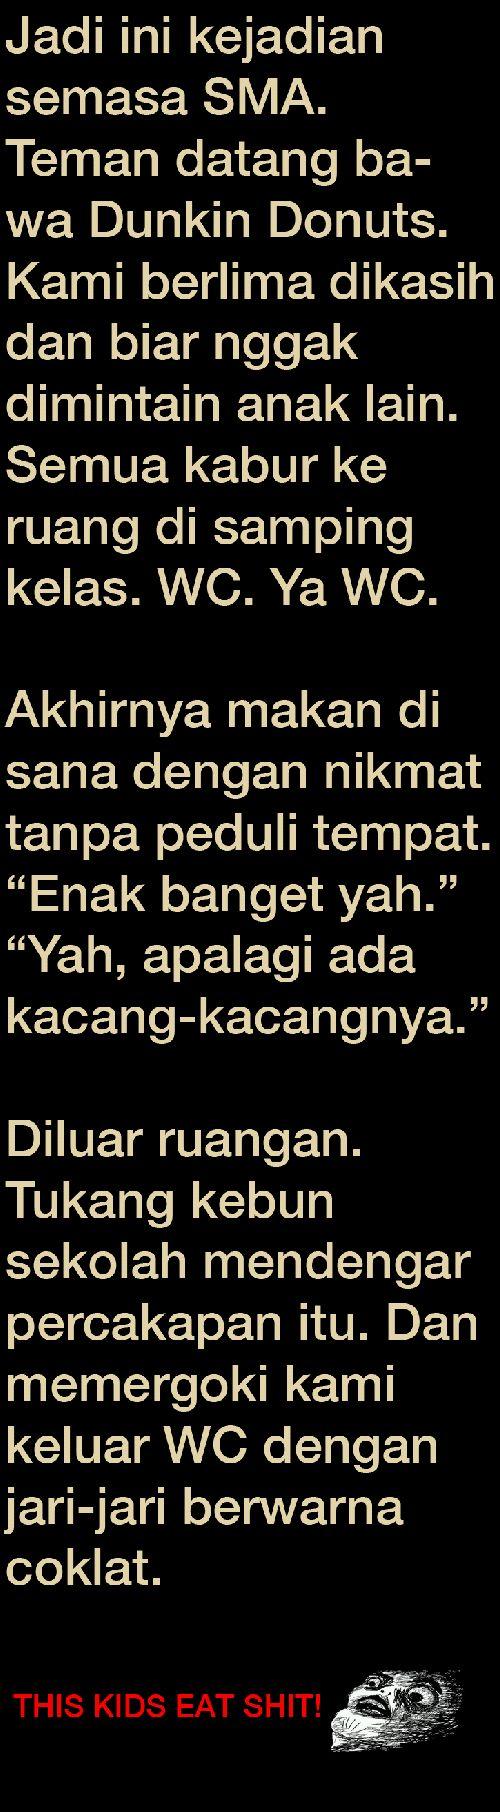 Funny Humor Indonesia DunkinDonut Lucu Wkwkwk Pinterest